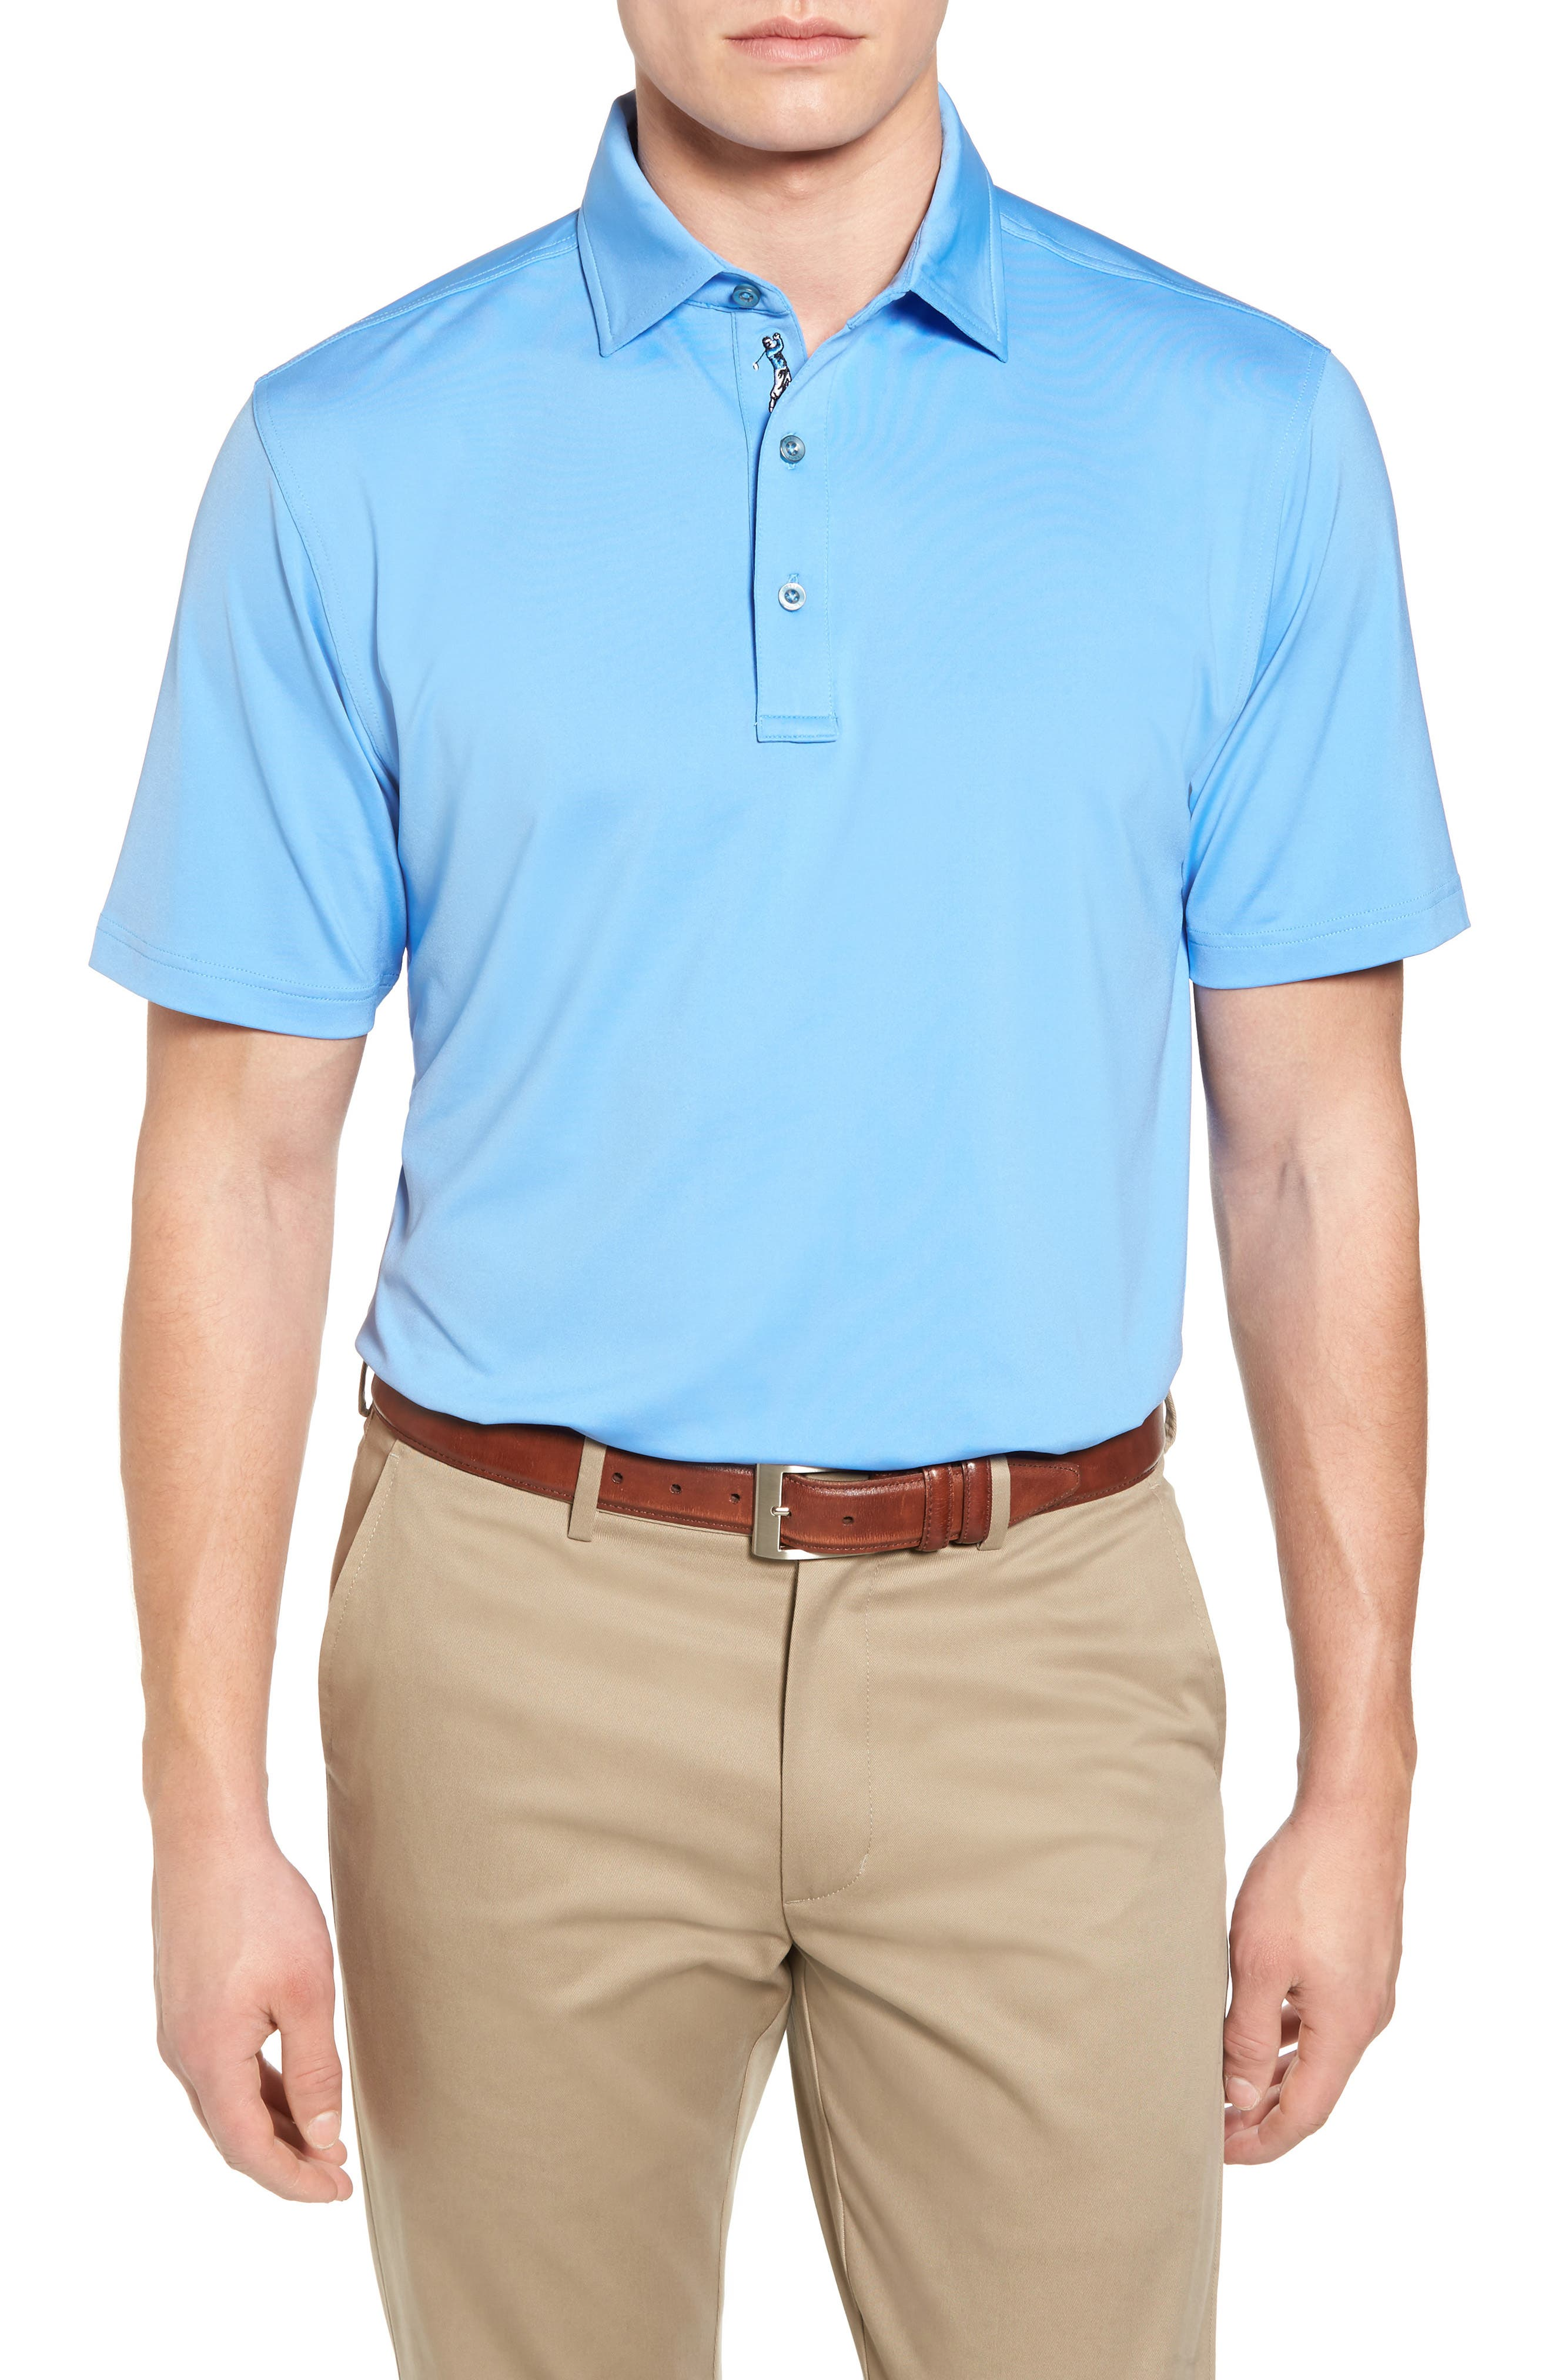 XH20 Regular Fit Stretch Golf Polo,                         Main,                         color, Sky Blue